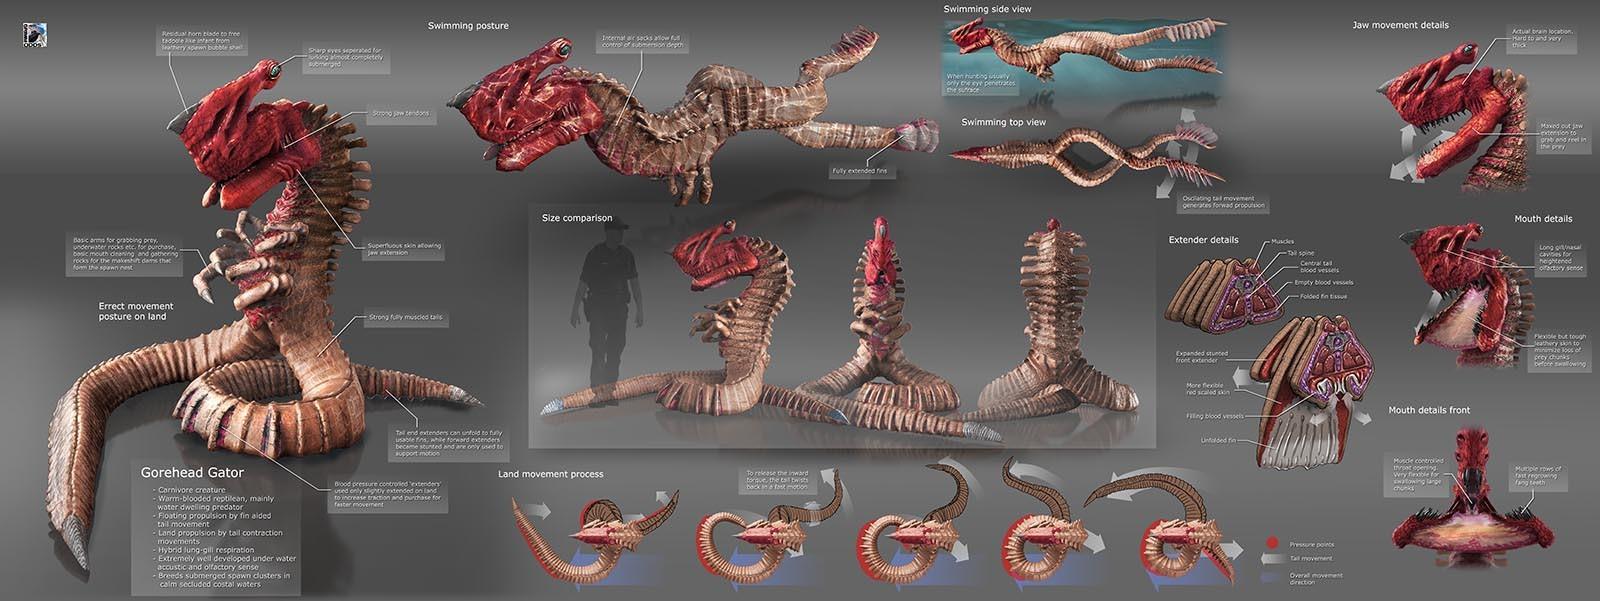 Francis goeltner grimmodds creatures temperatecontinent goreheadgator plainsig s